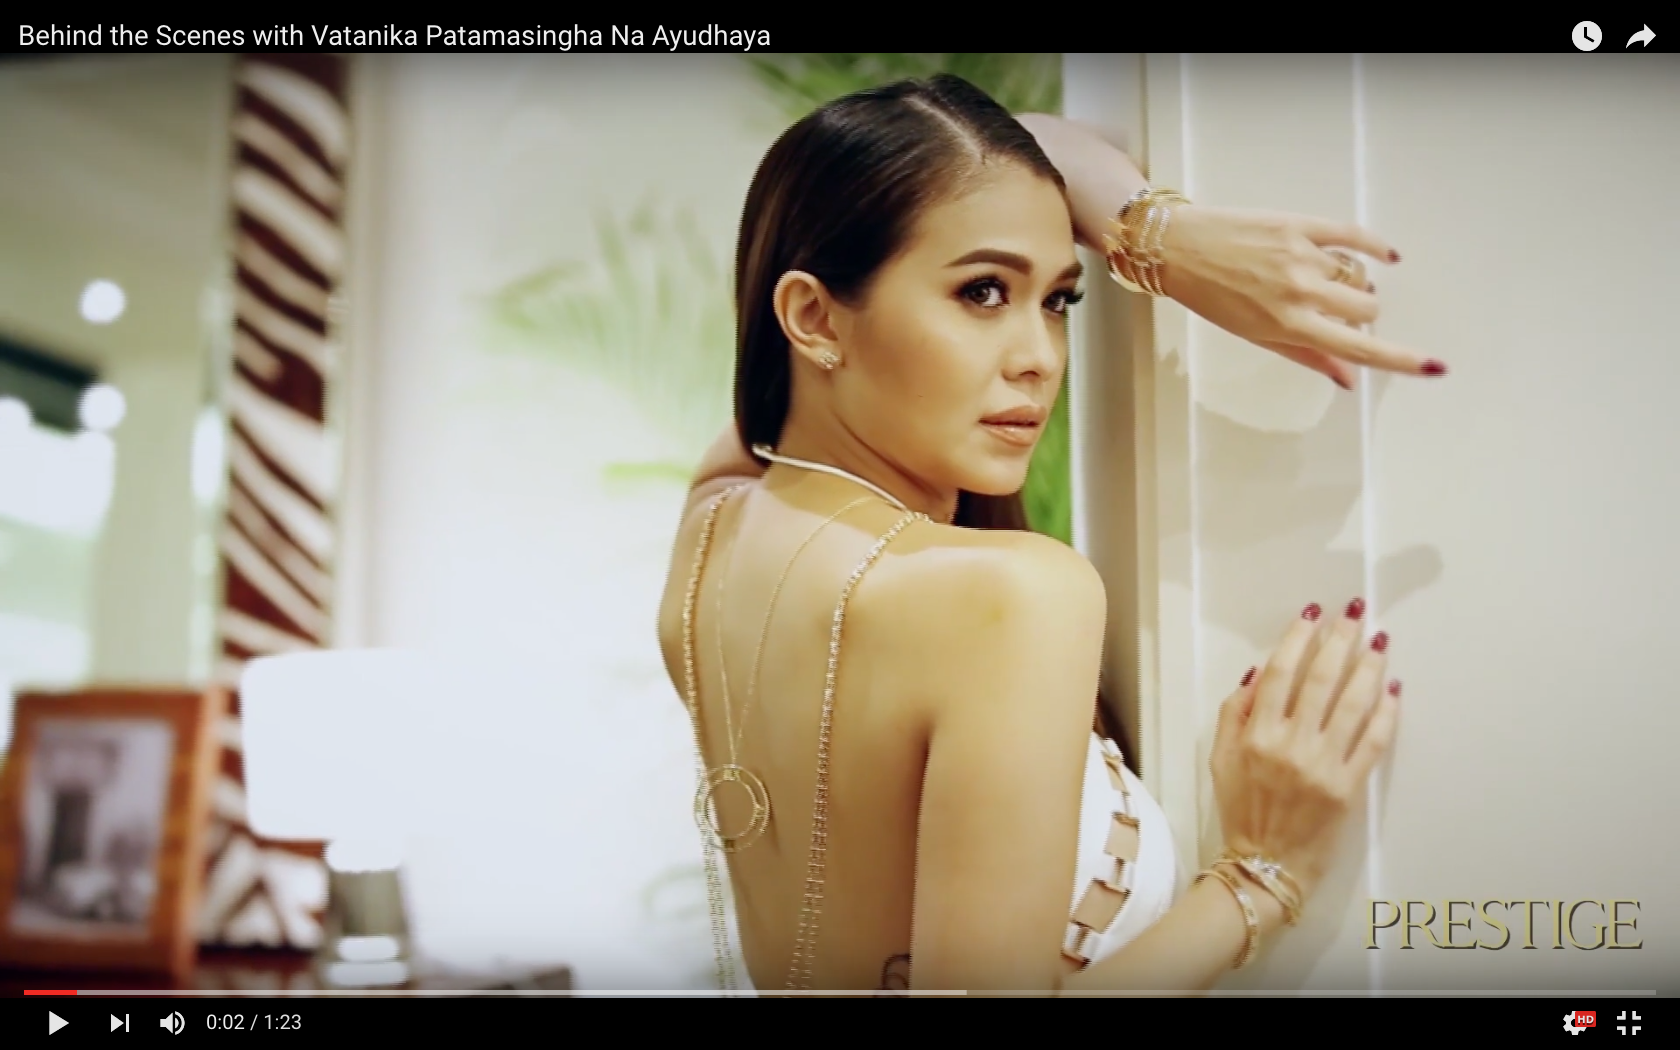 [VIDEO] Behind the Scenes with Vatanika Patamasingha